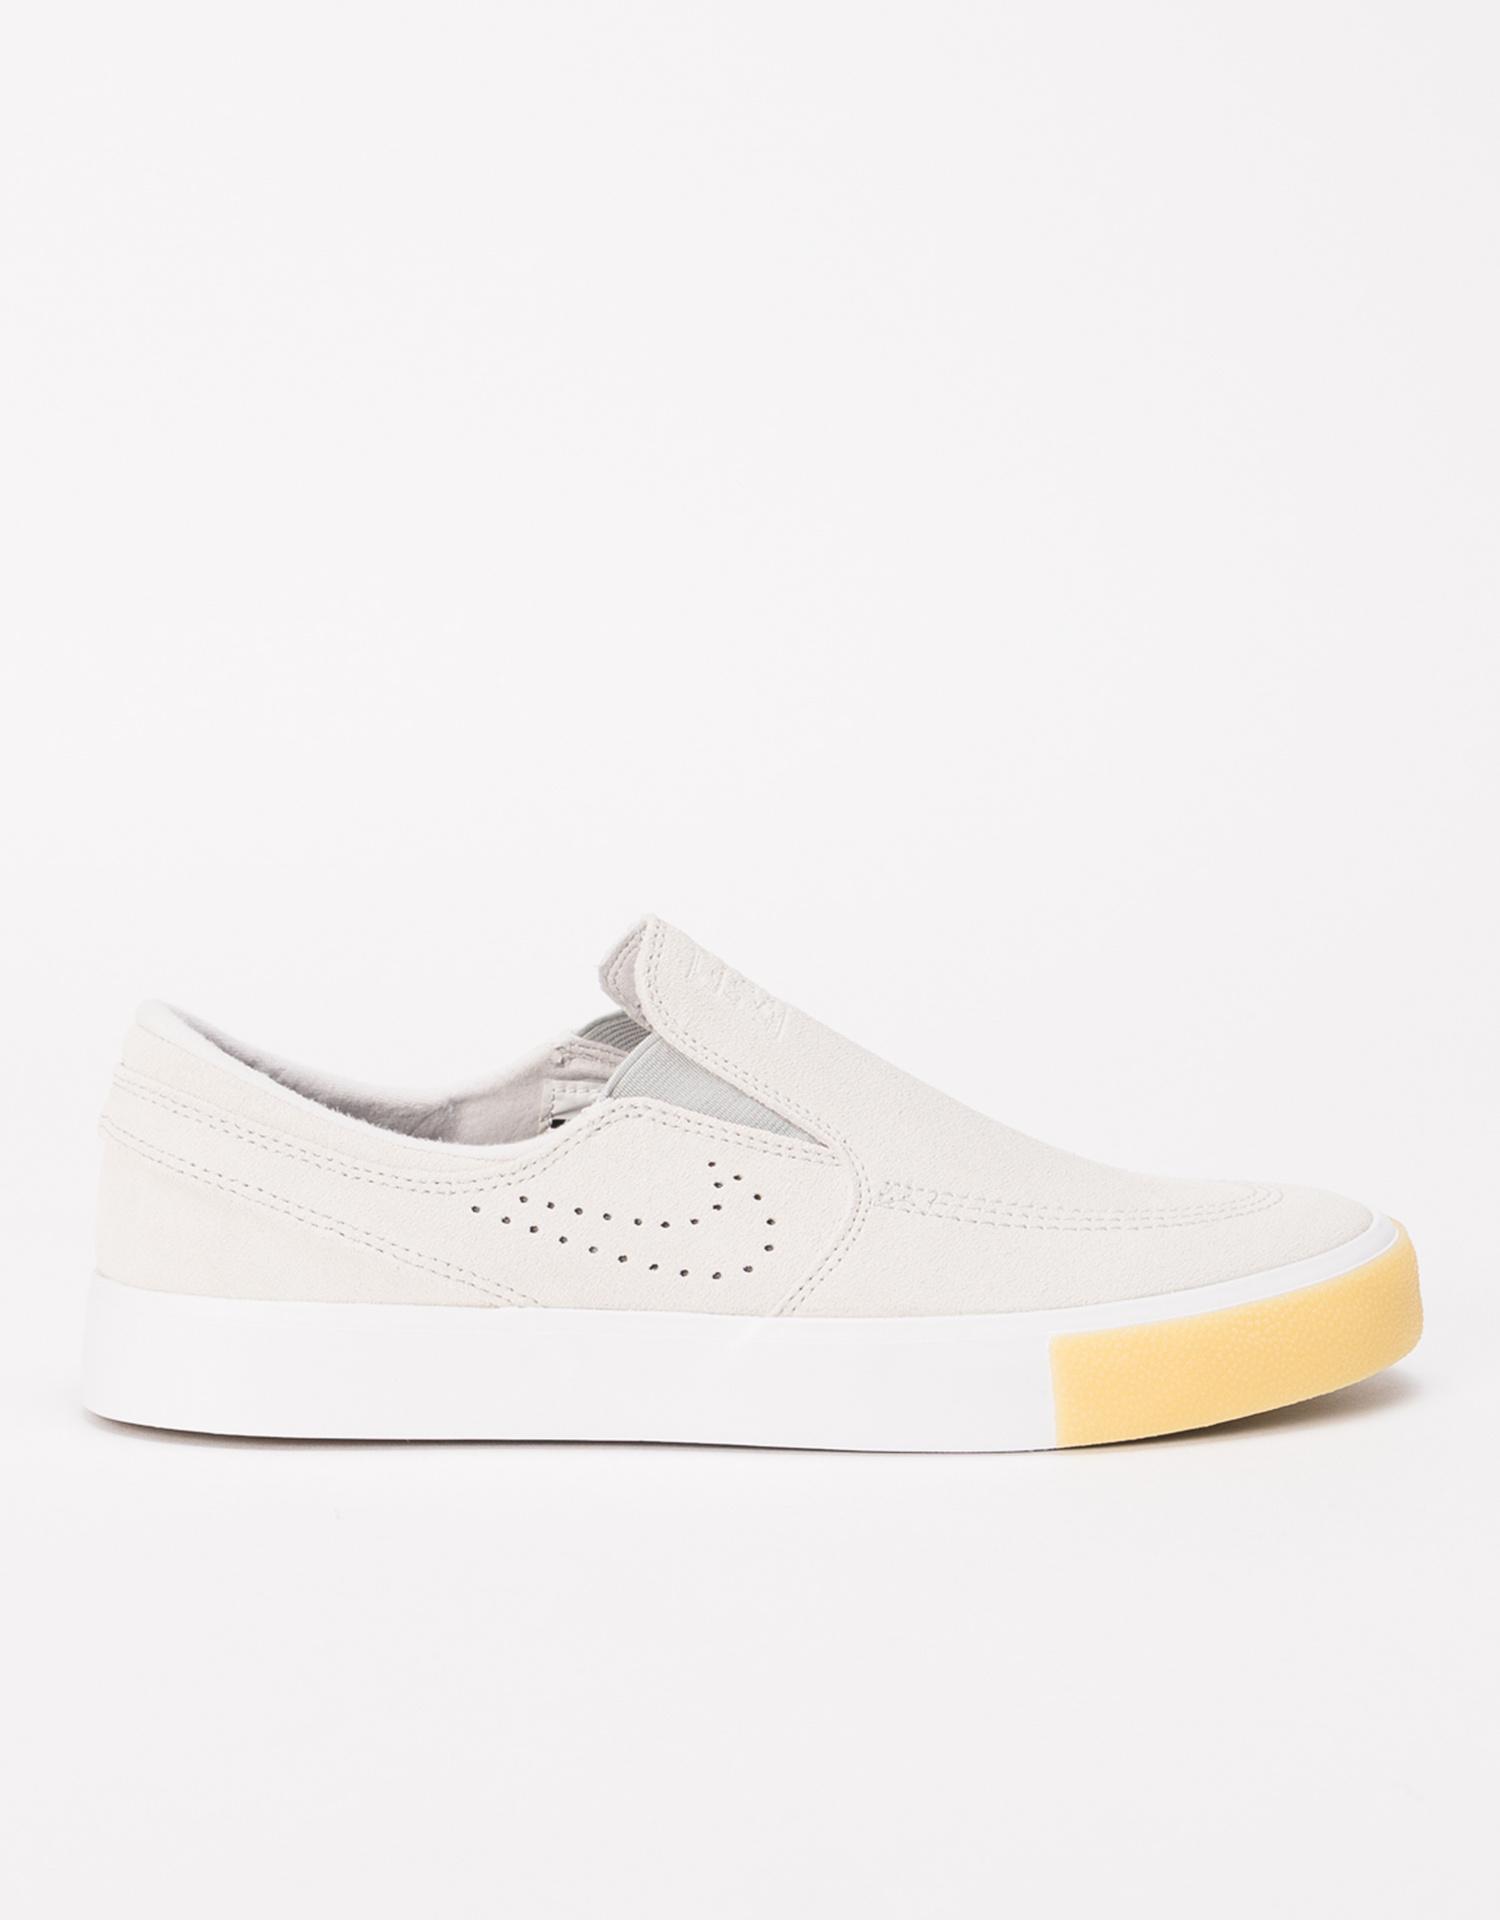 Nike SB Zoom Janoski Slip RM SE white/white-vast grey-gum yellow